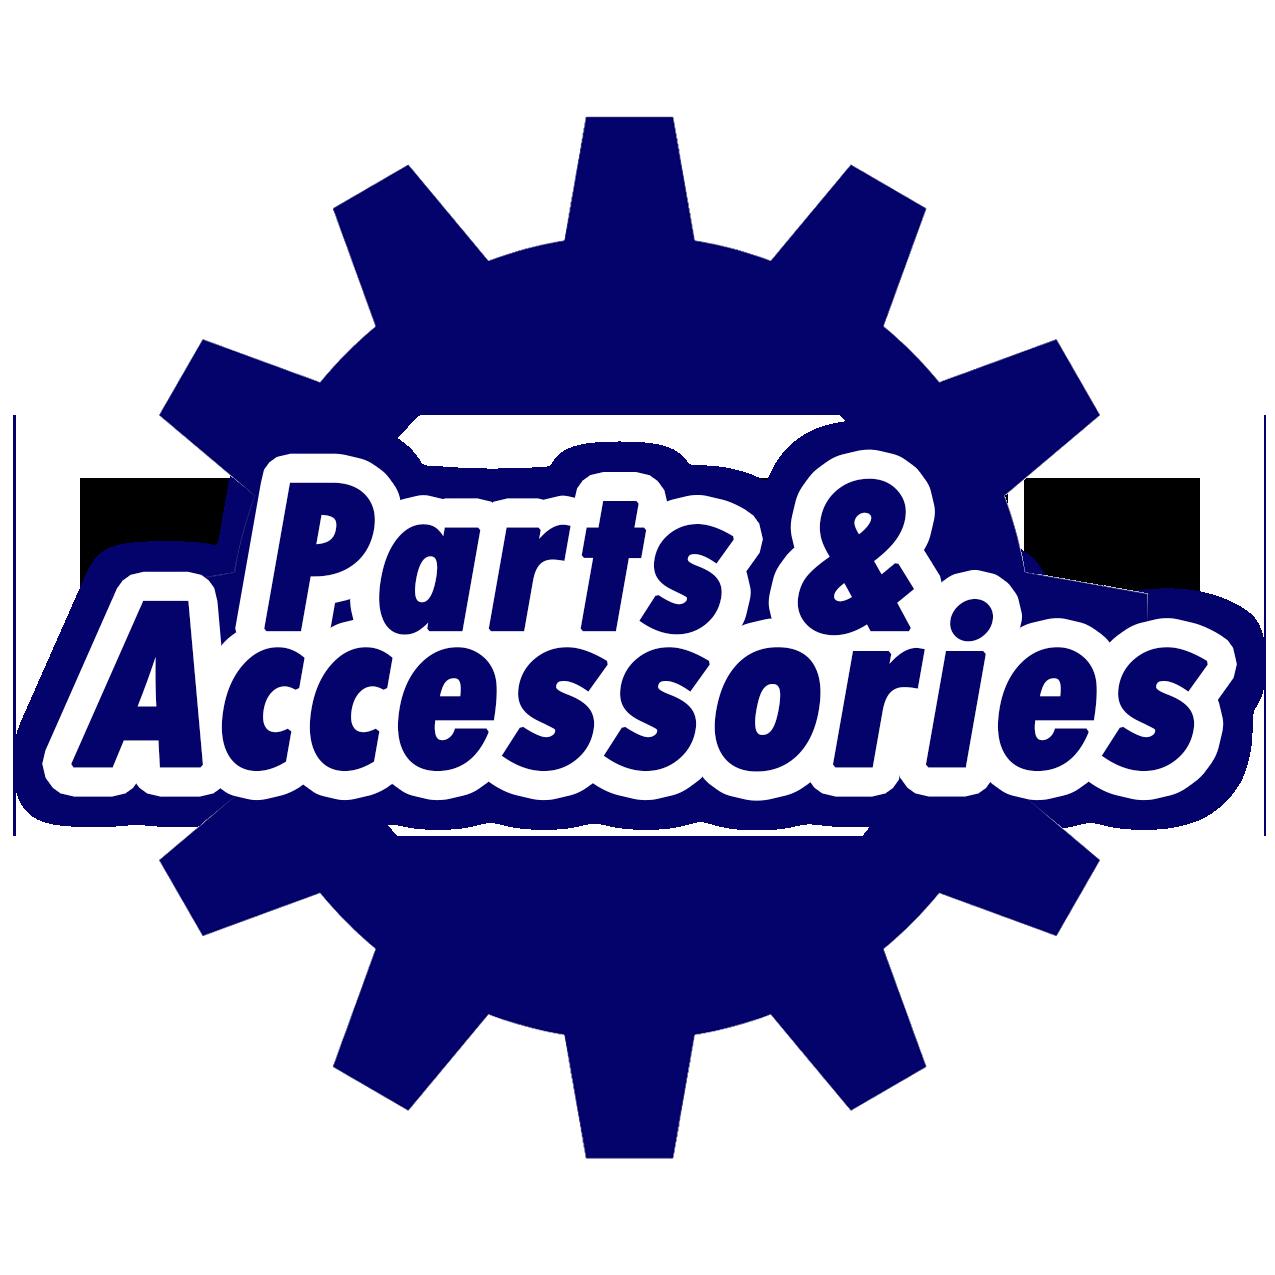 Parts&AccessGeneric.png